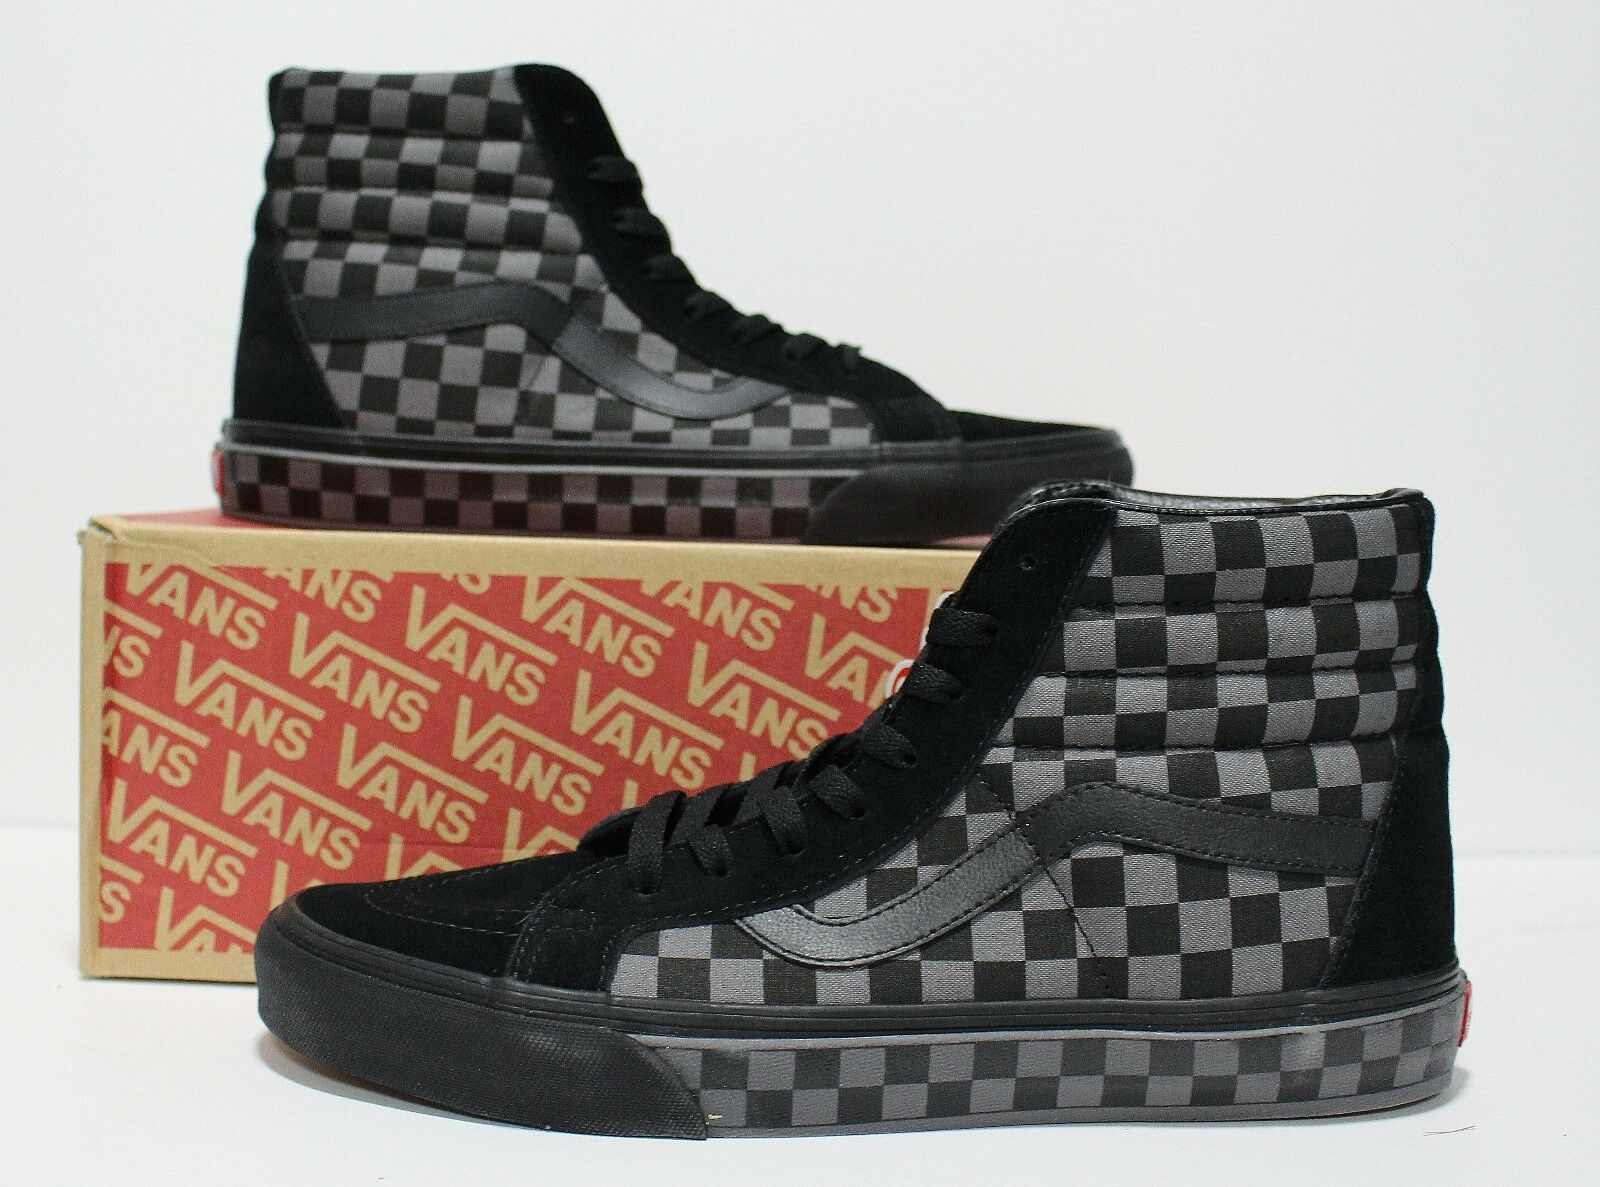 Vans SK8 Hi Reissue Checkerboard Black Pewter Women's Size    5.5 79d00a